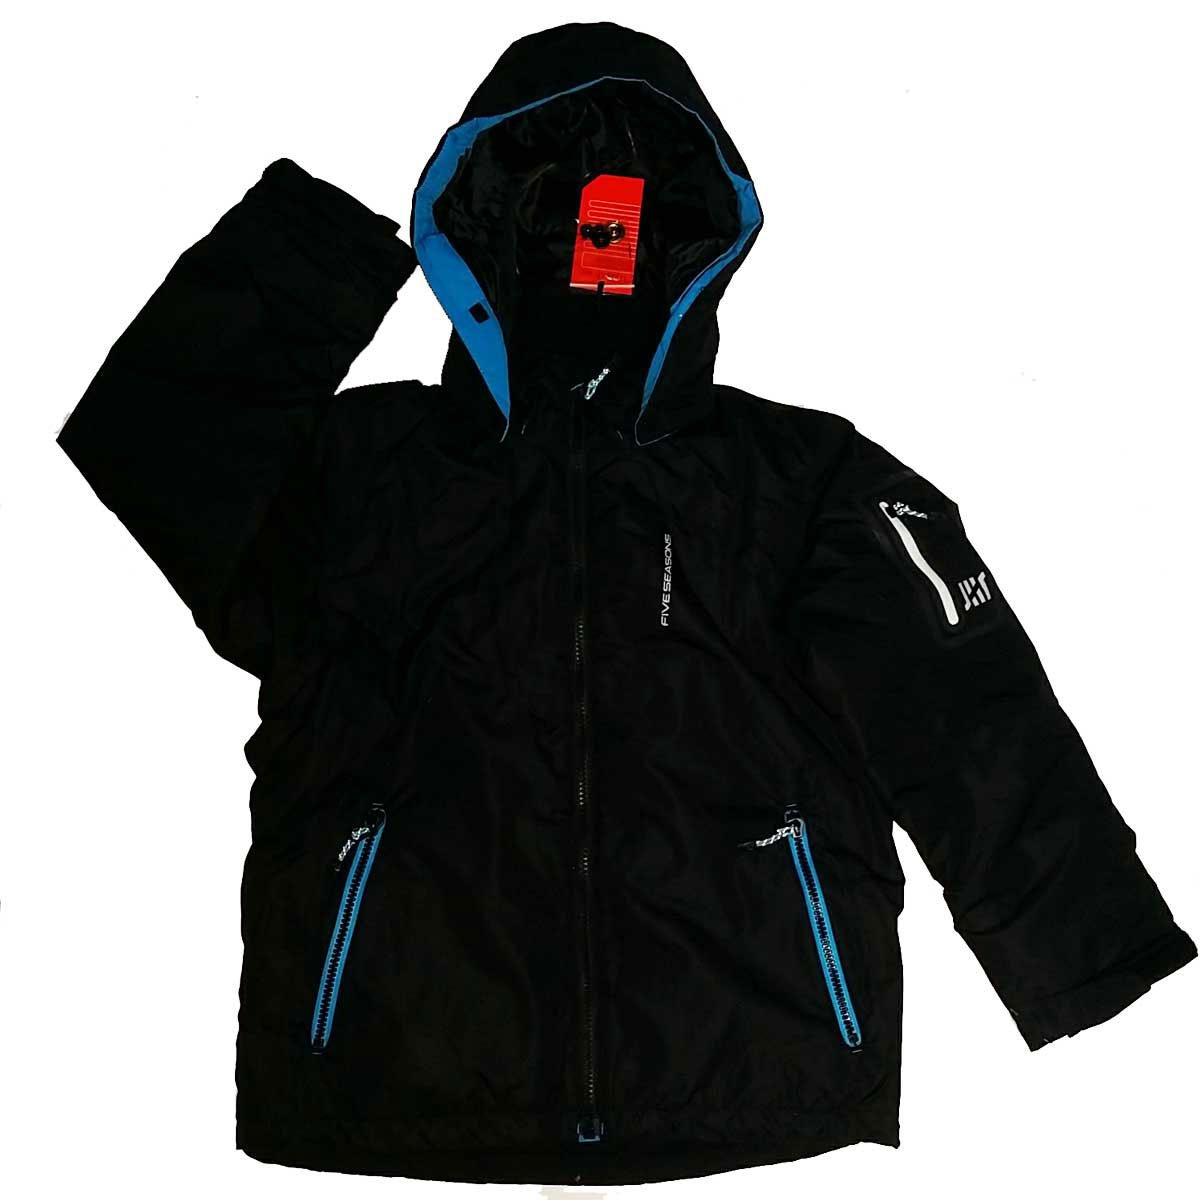 8f4dd57182 Five Seasons Boys Mitch Ski Jacket   Pants Suit  Amazon.co.uk  Sports    Outdoors